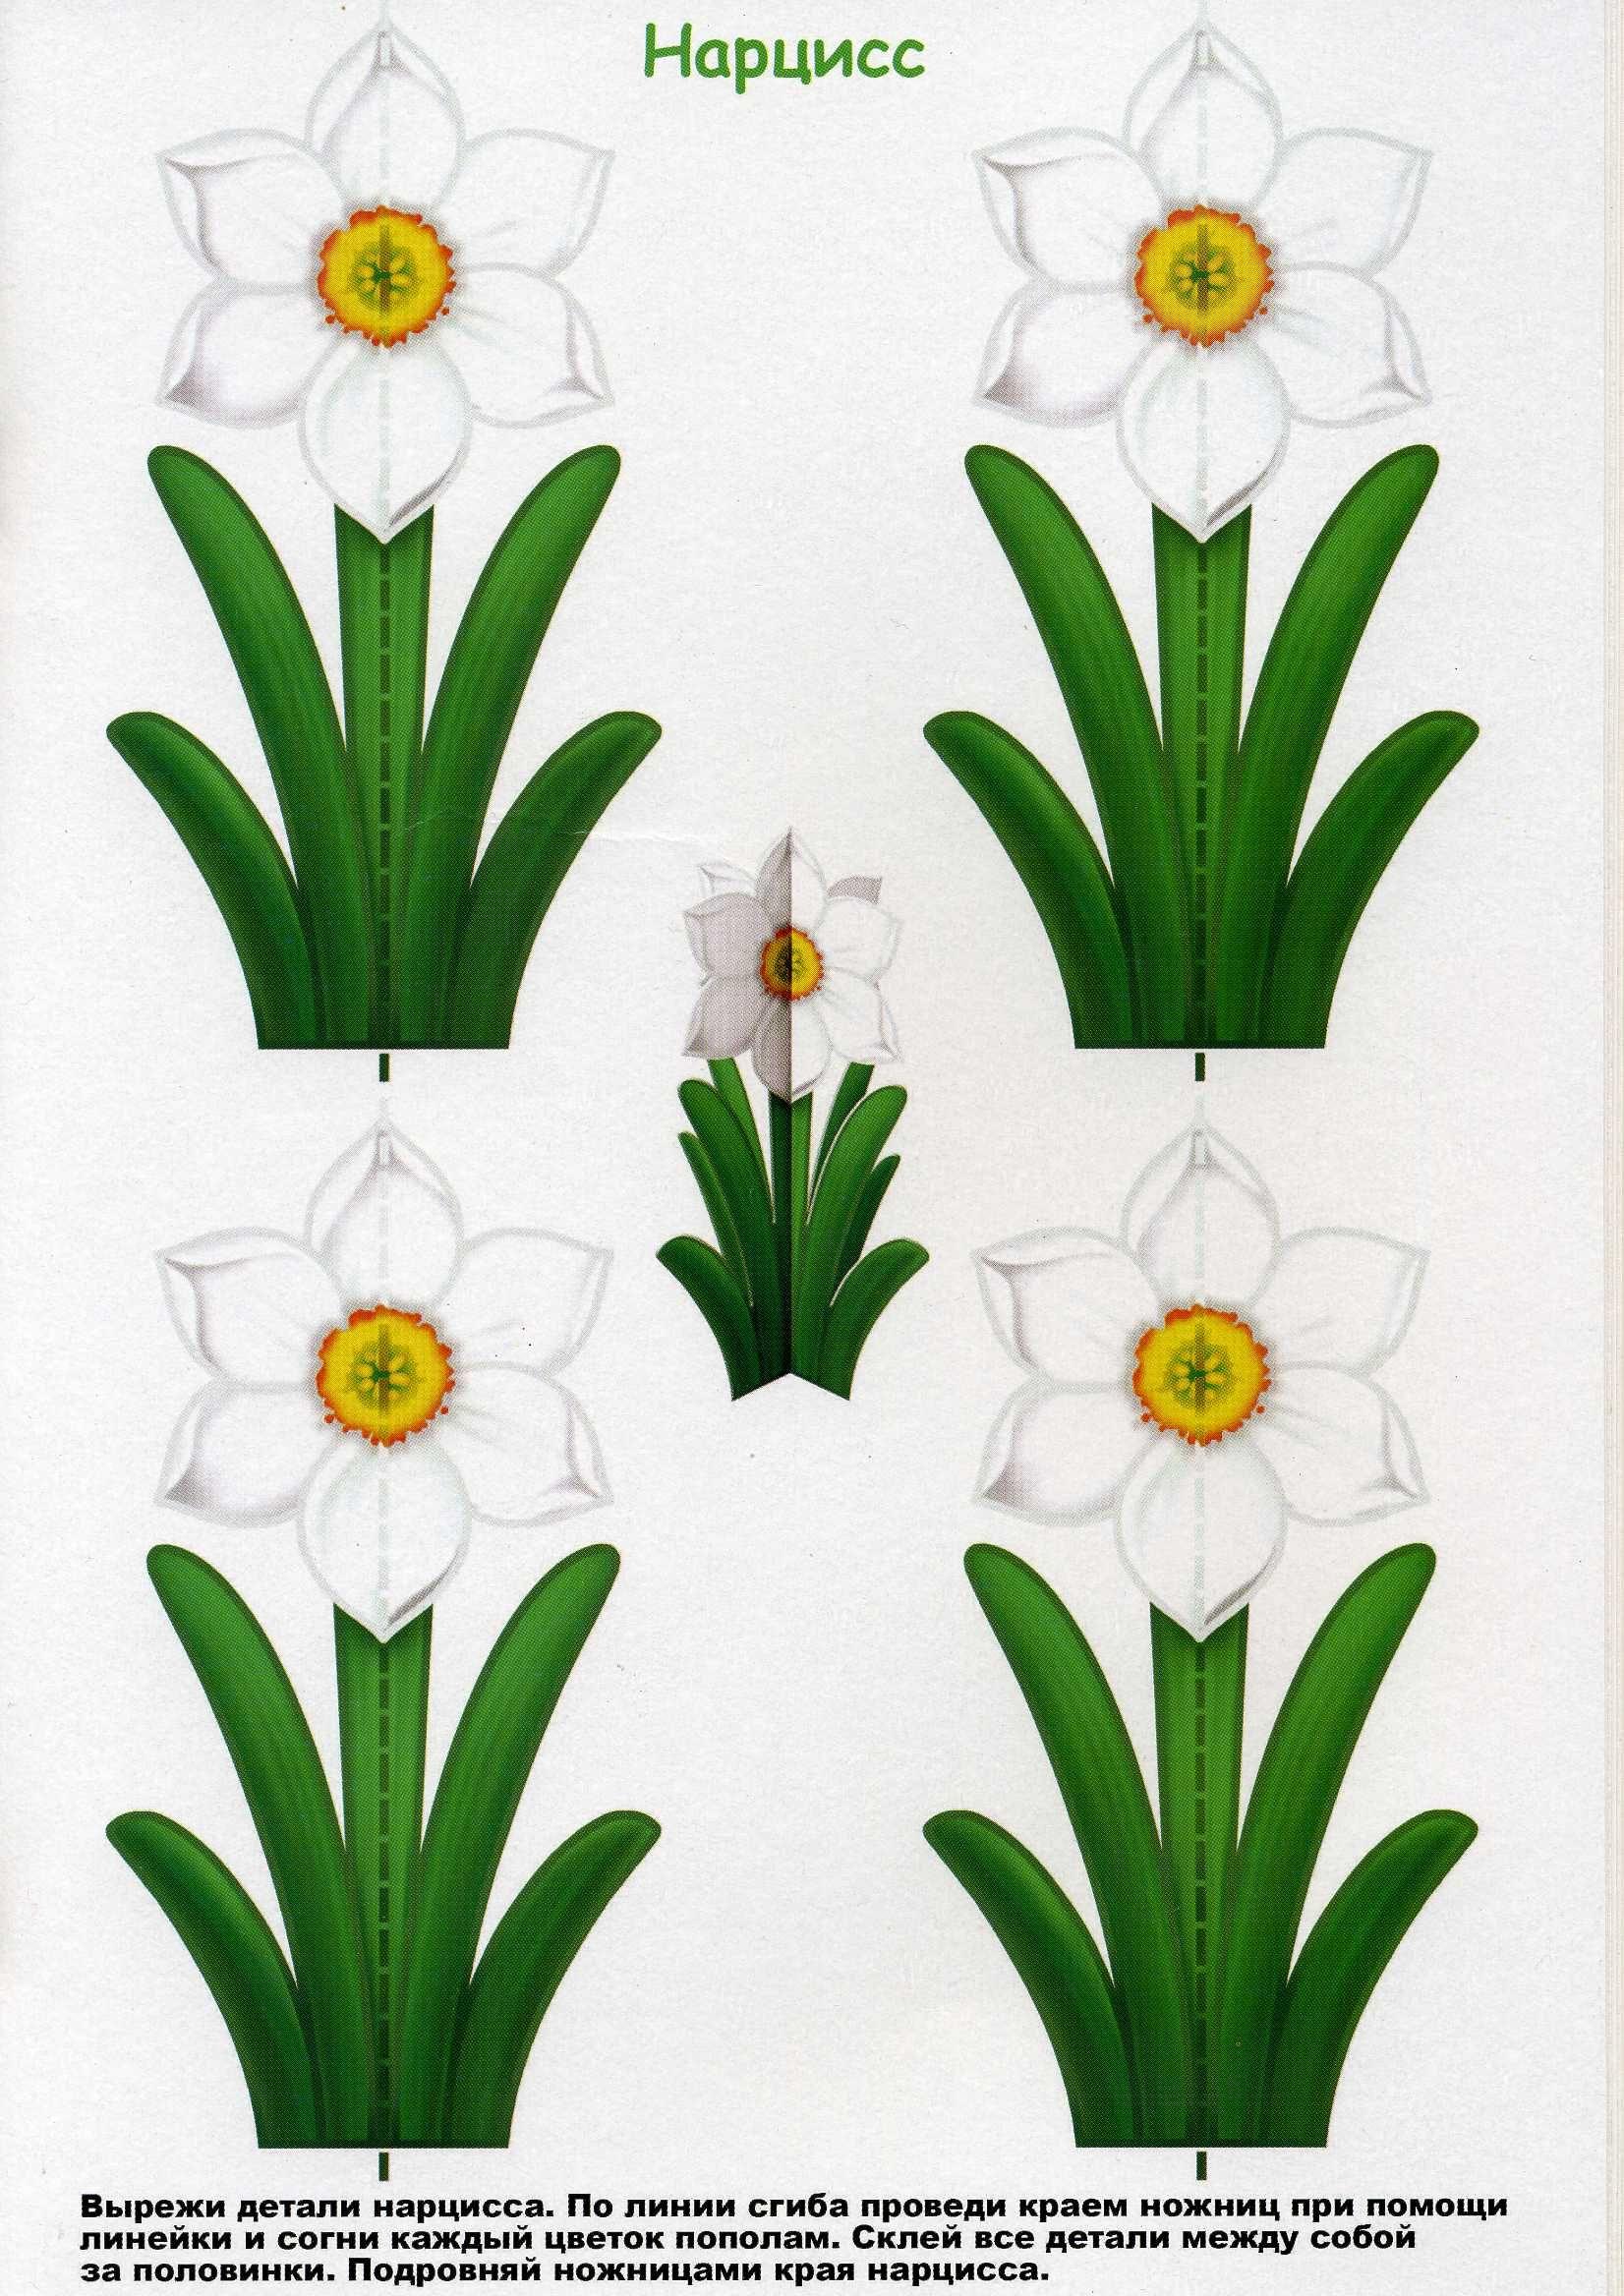 Pin by evelien van der vinne on creatief pinterest flowers jar